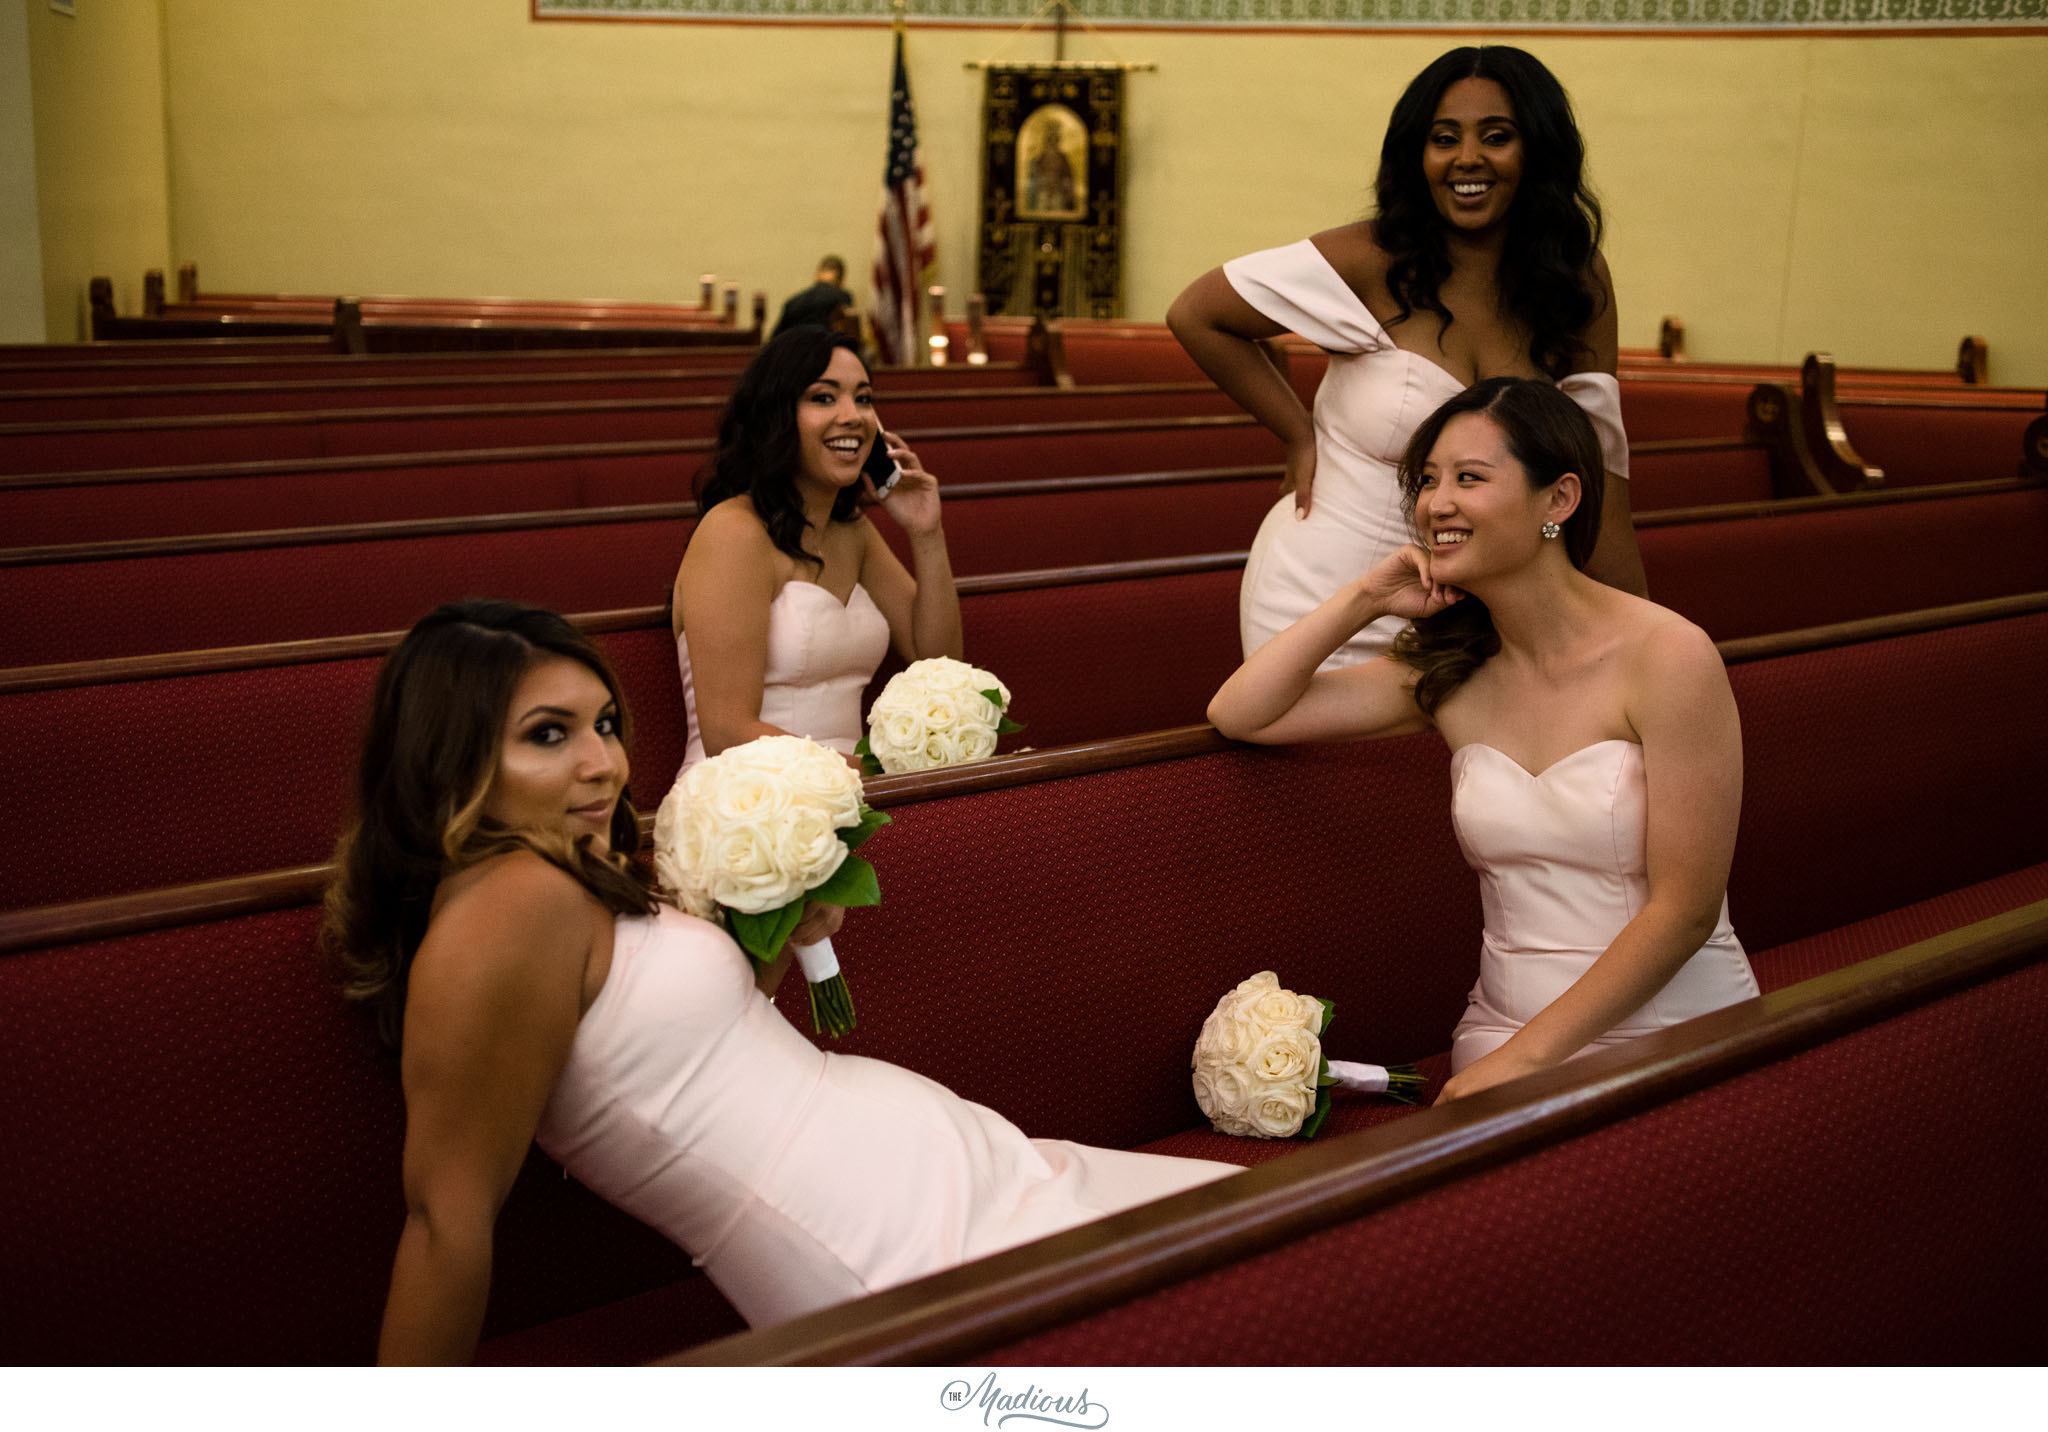 nmwa+wedding,+women+in+the+arts+wedding,+ethiopian+wedding,+dc+wedding+0109.jpg